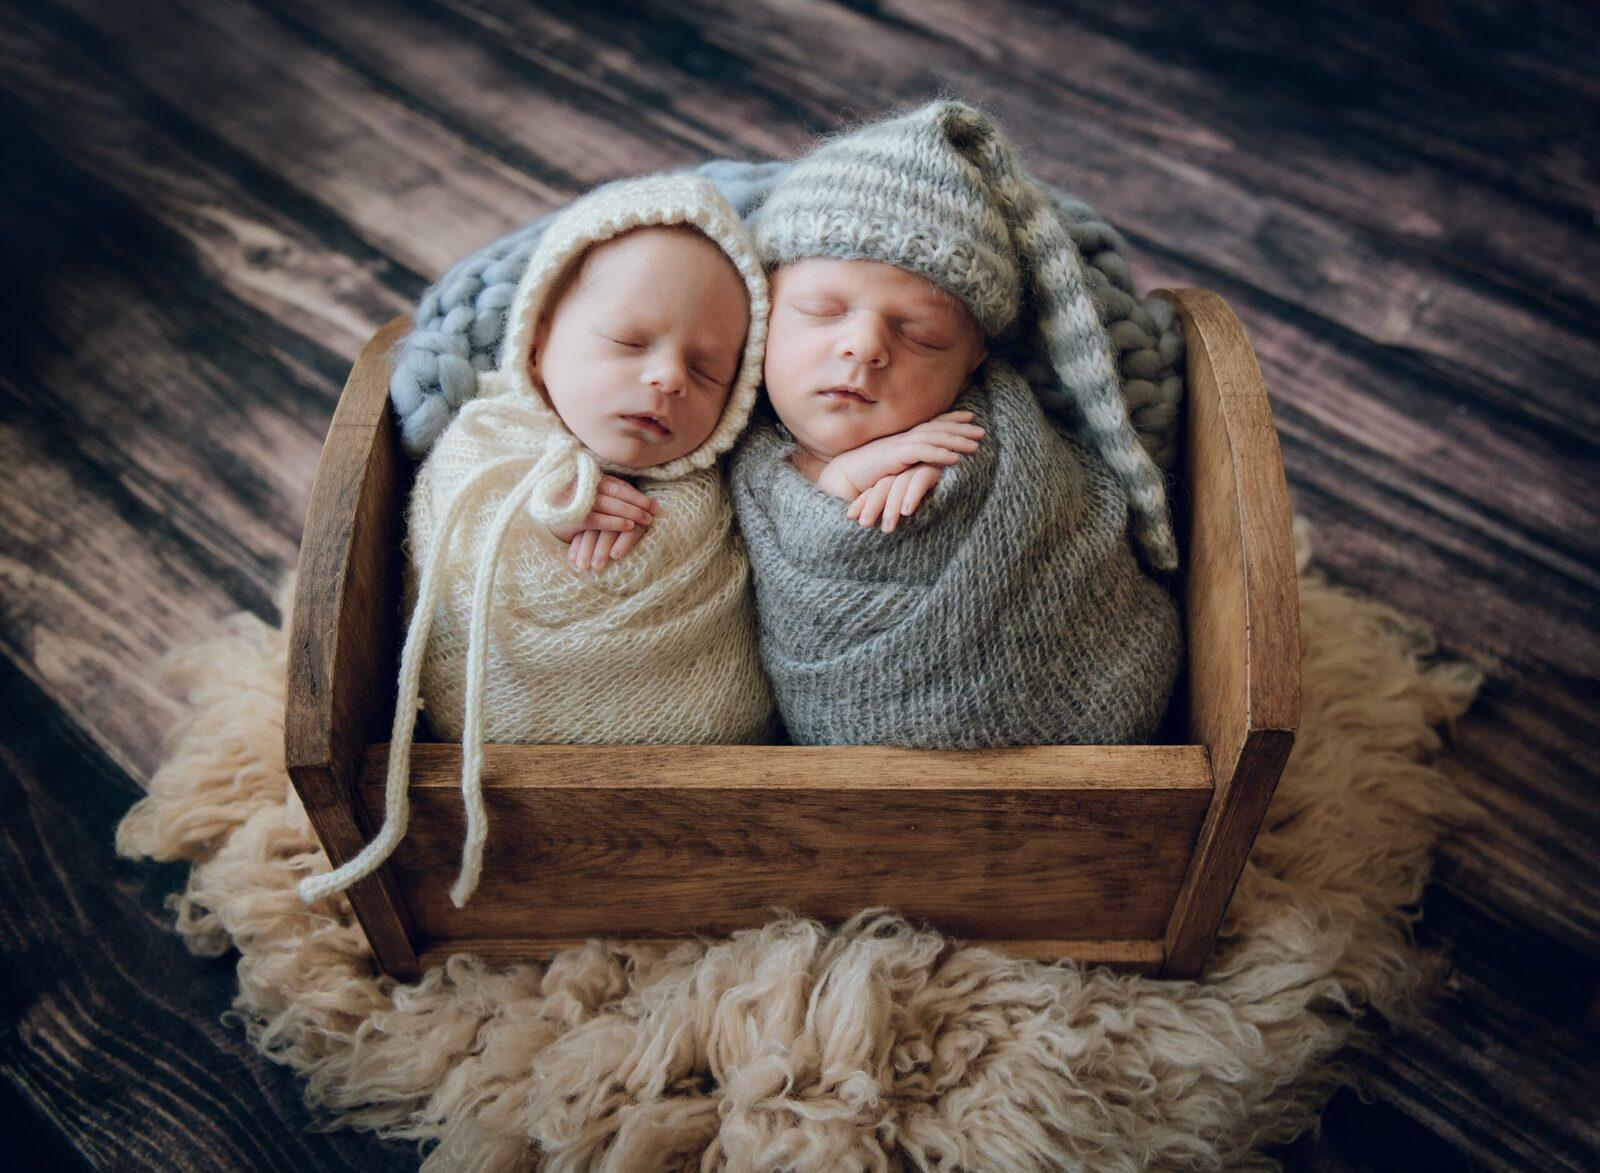 newborn twin baby sister and brother potato sack pose in crib